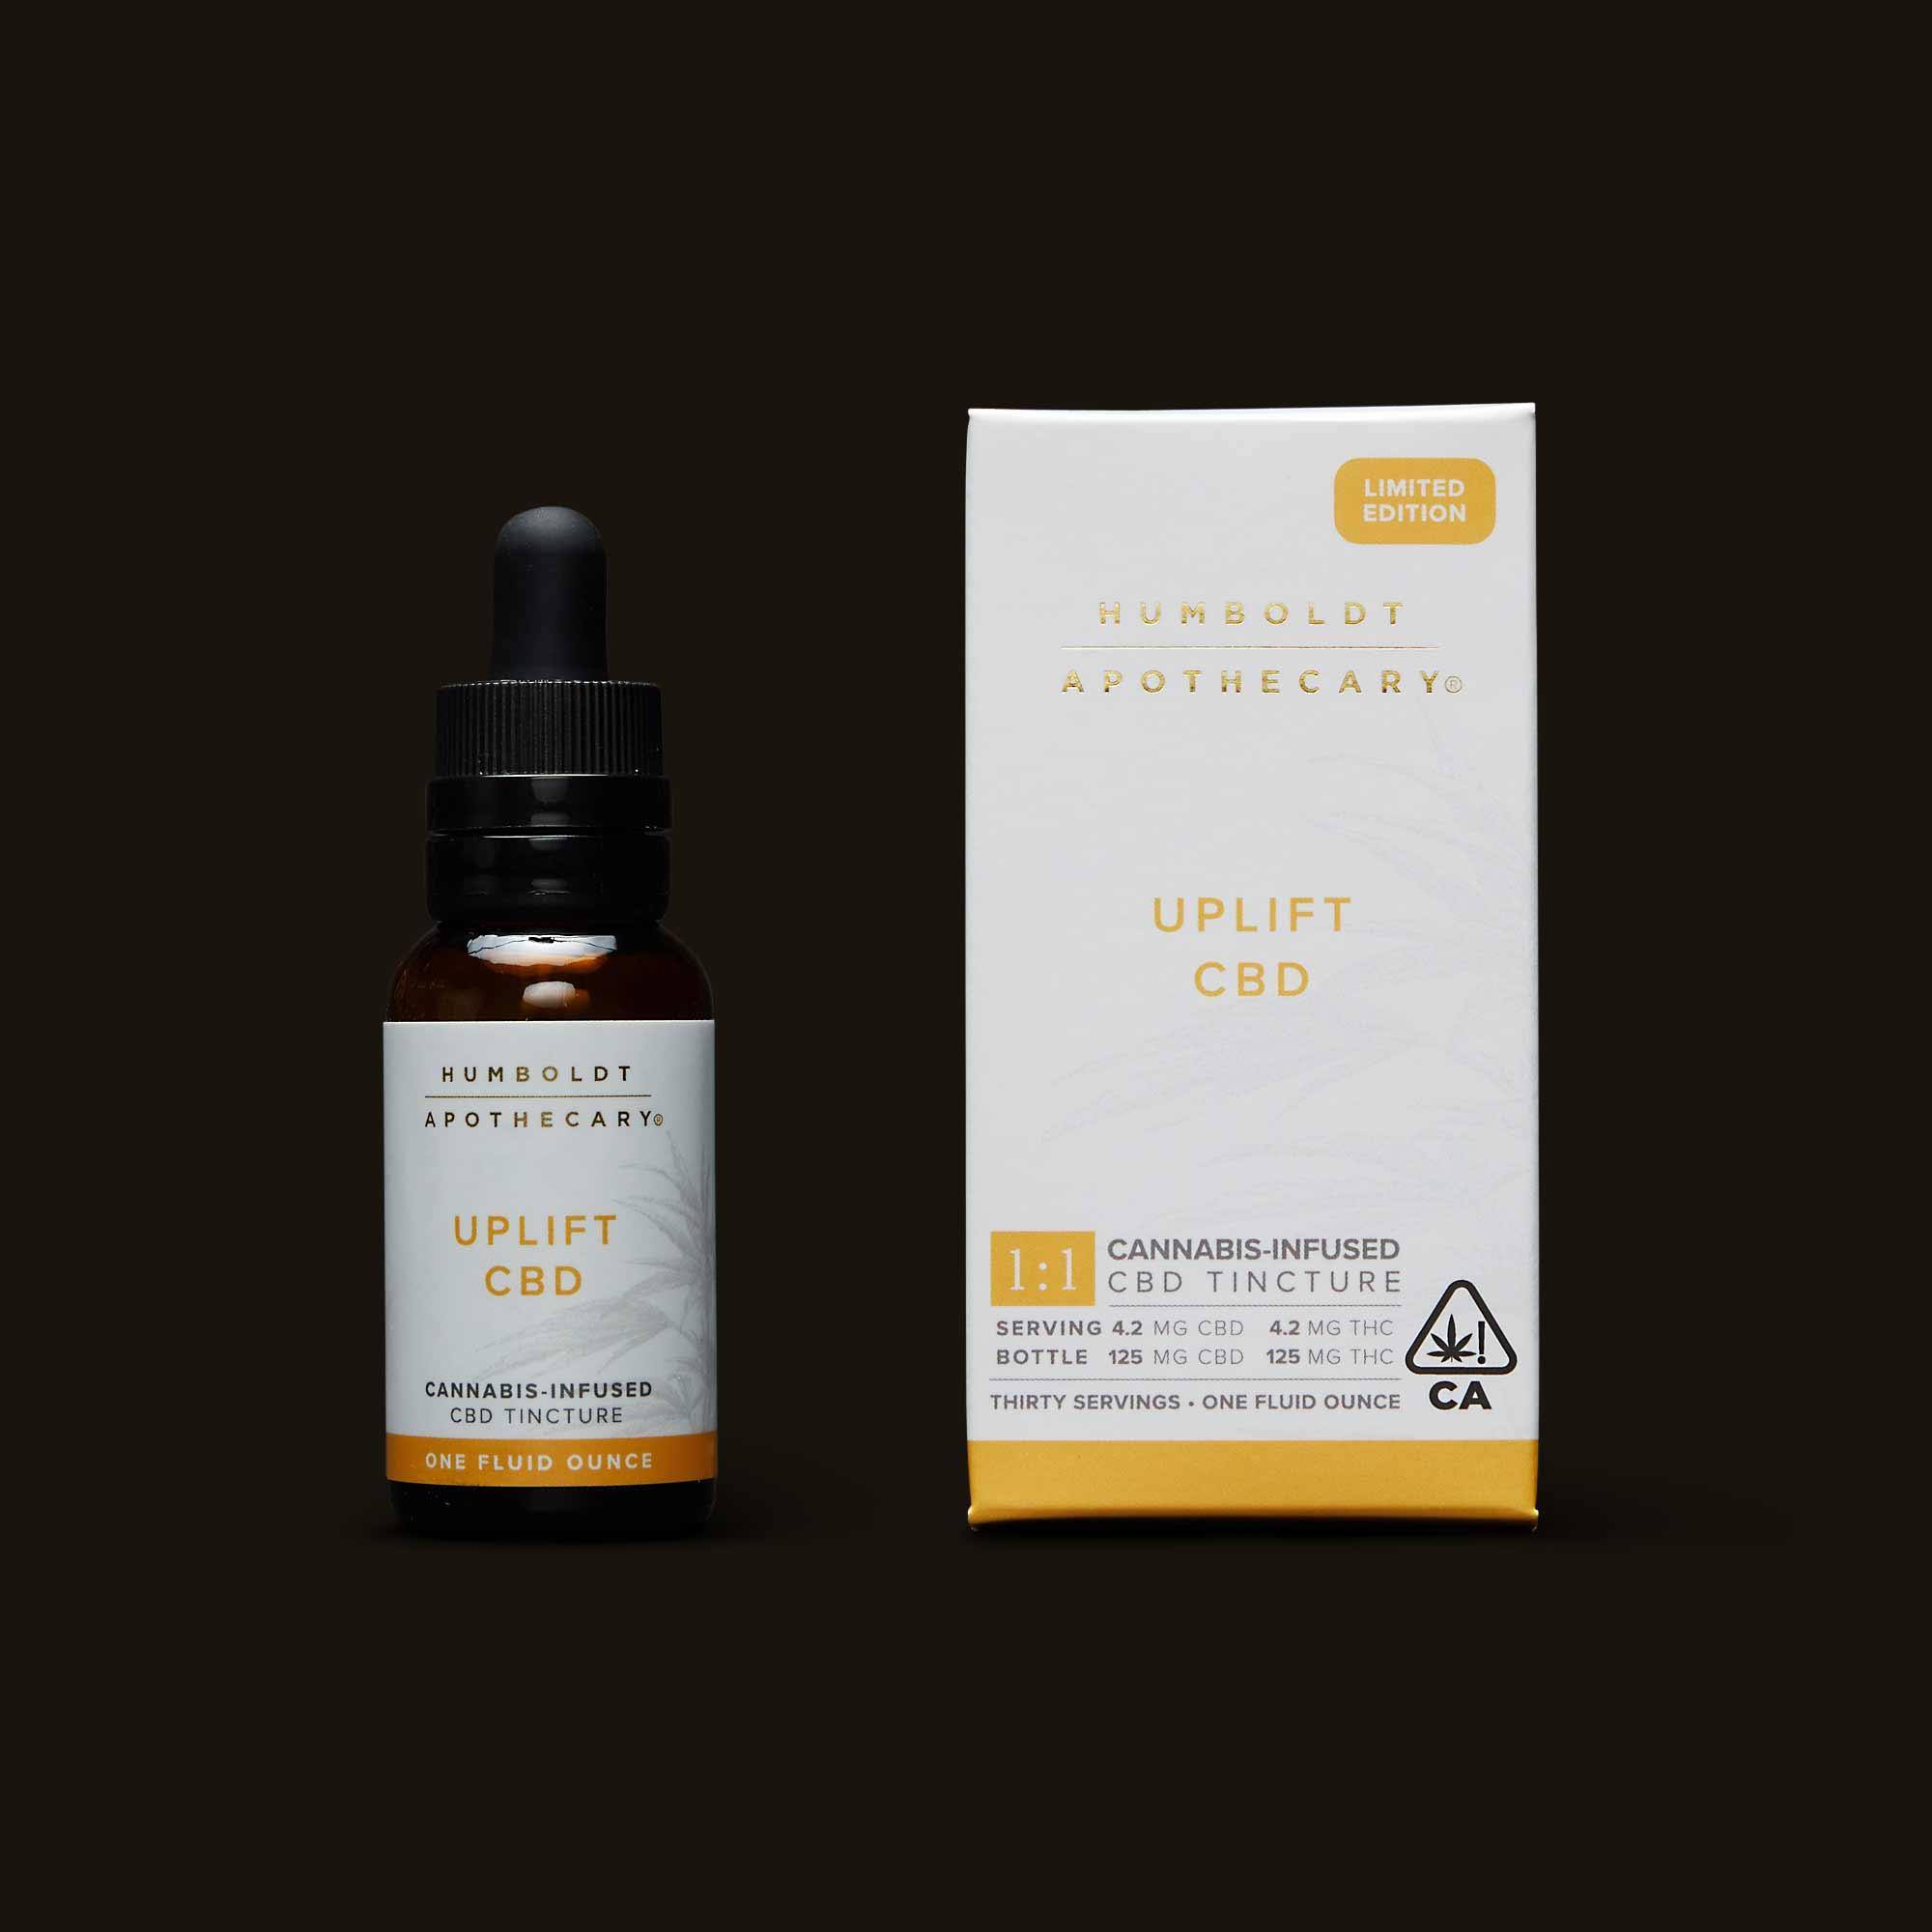 Uplift CBD - One 30ml bottle (250mg THC, 250mg CBD)